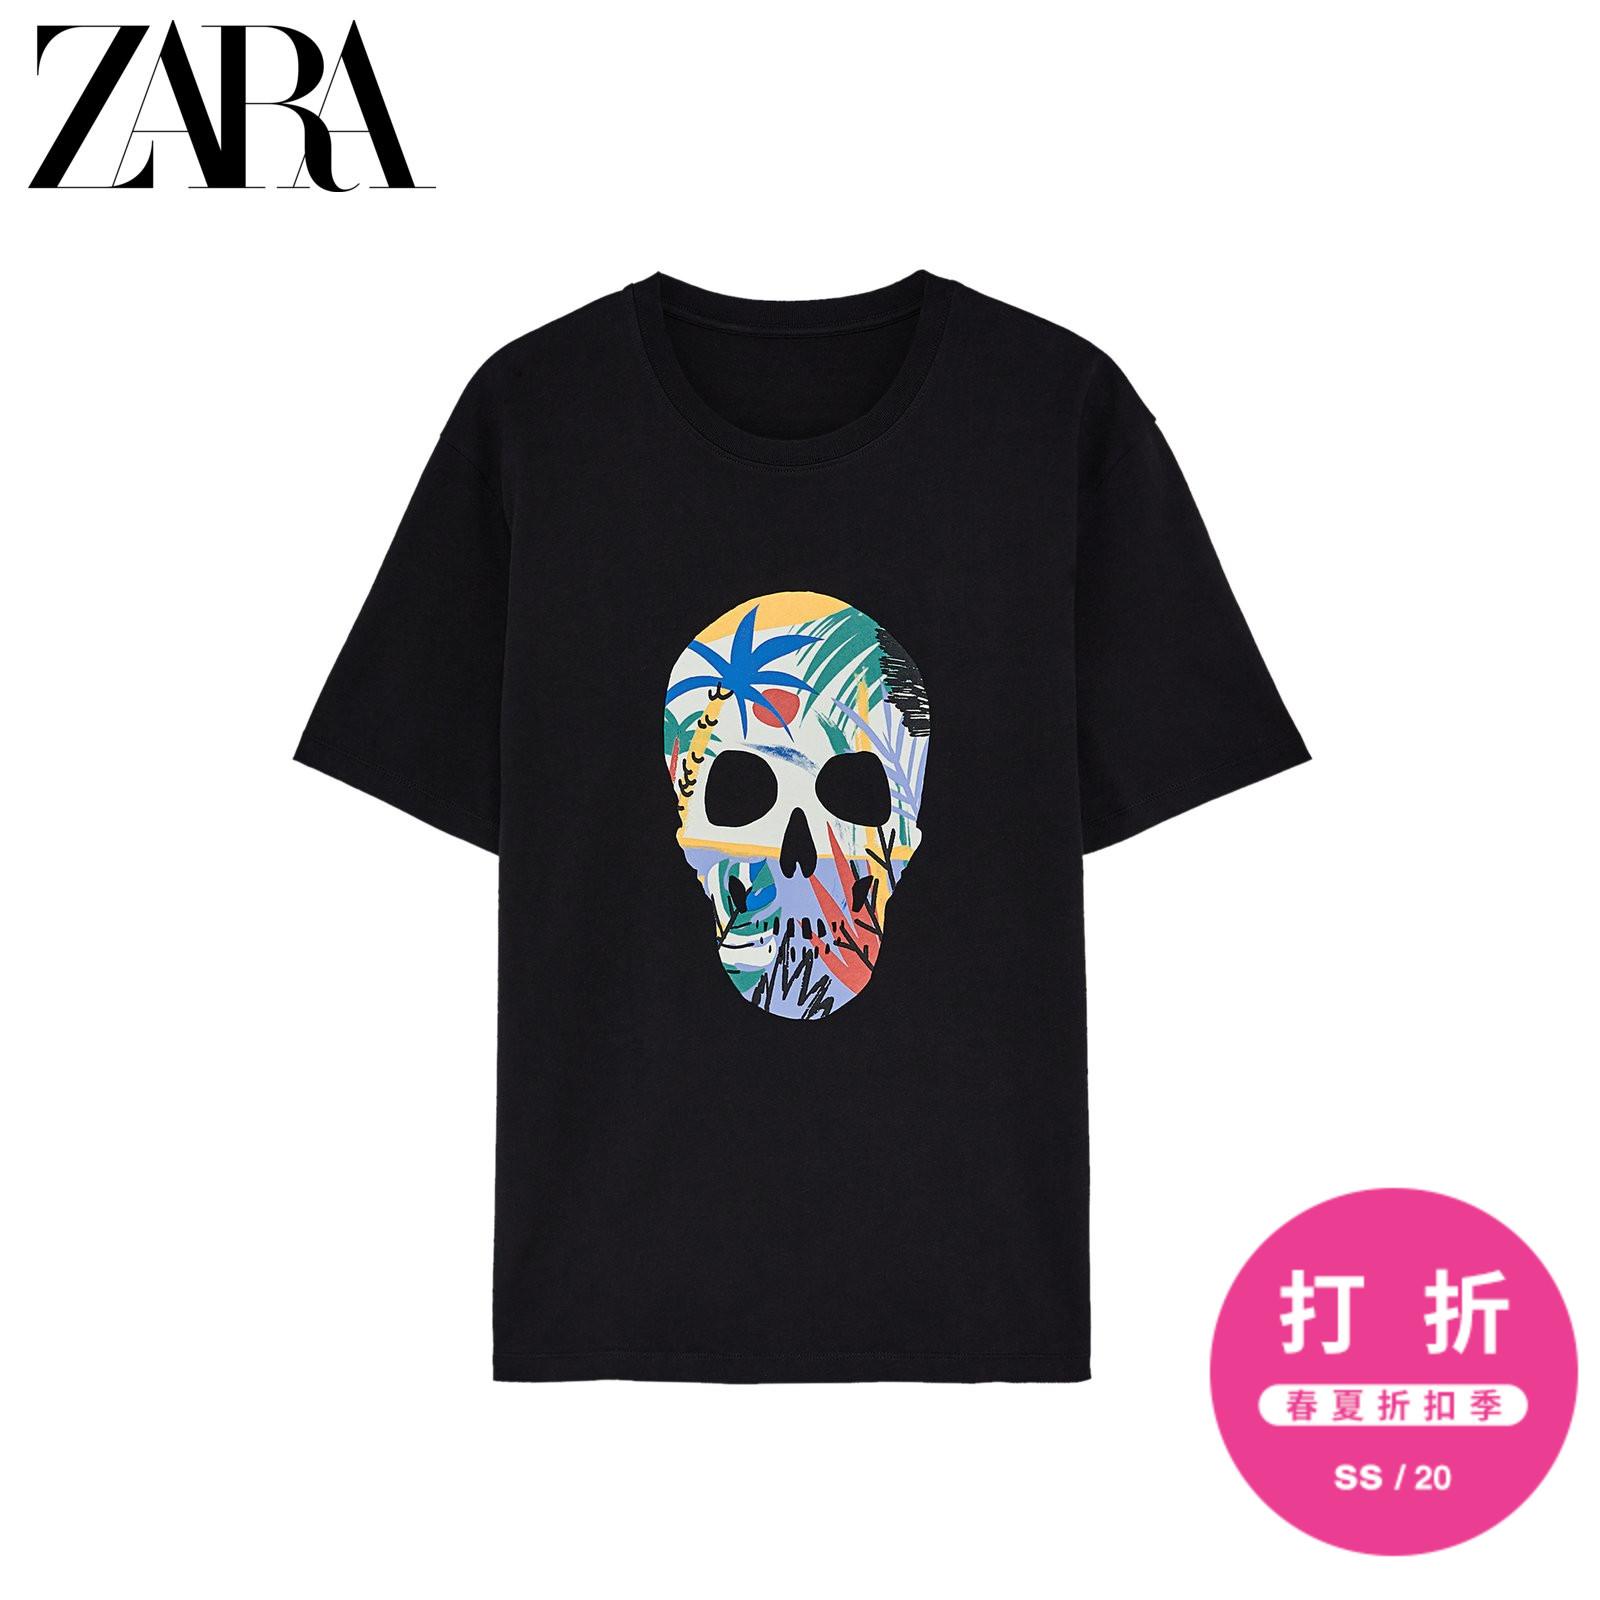 ZARA新款 男裝 骷髏印花 T 恤 01165422800,降價幅度55.9%